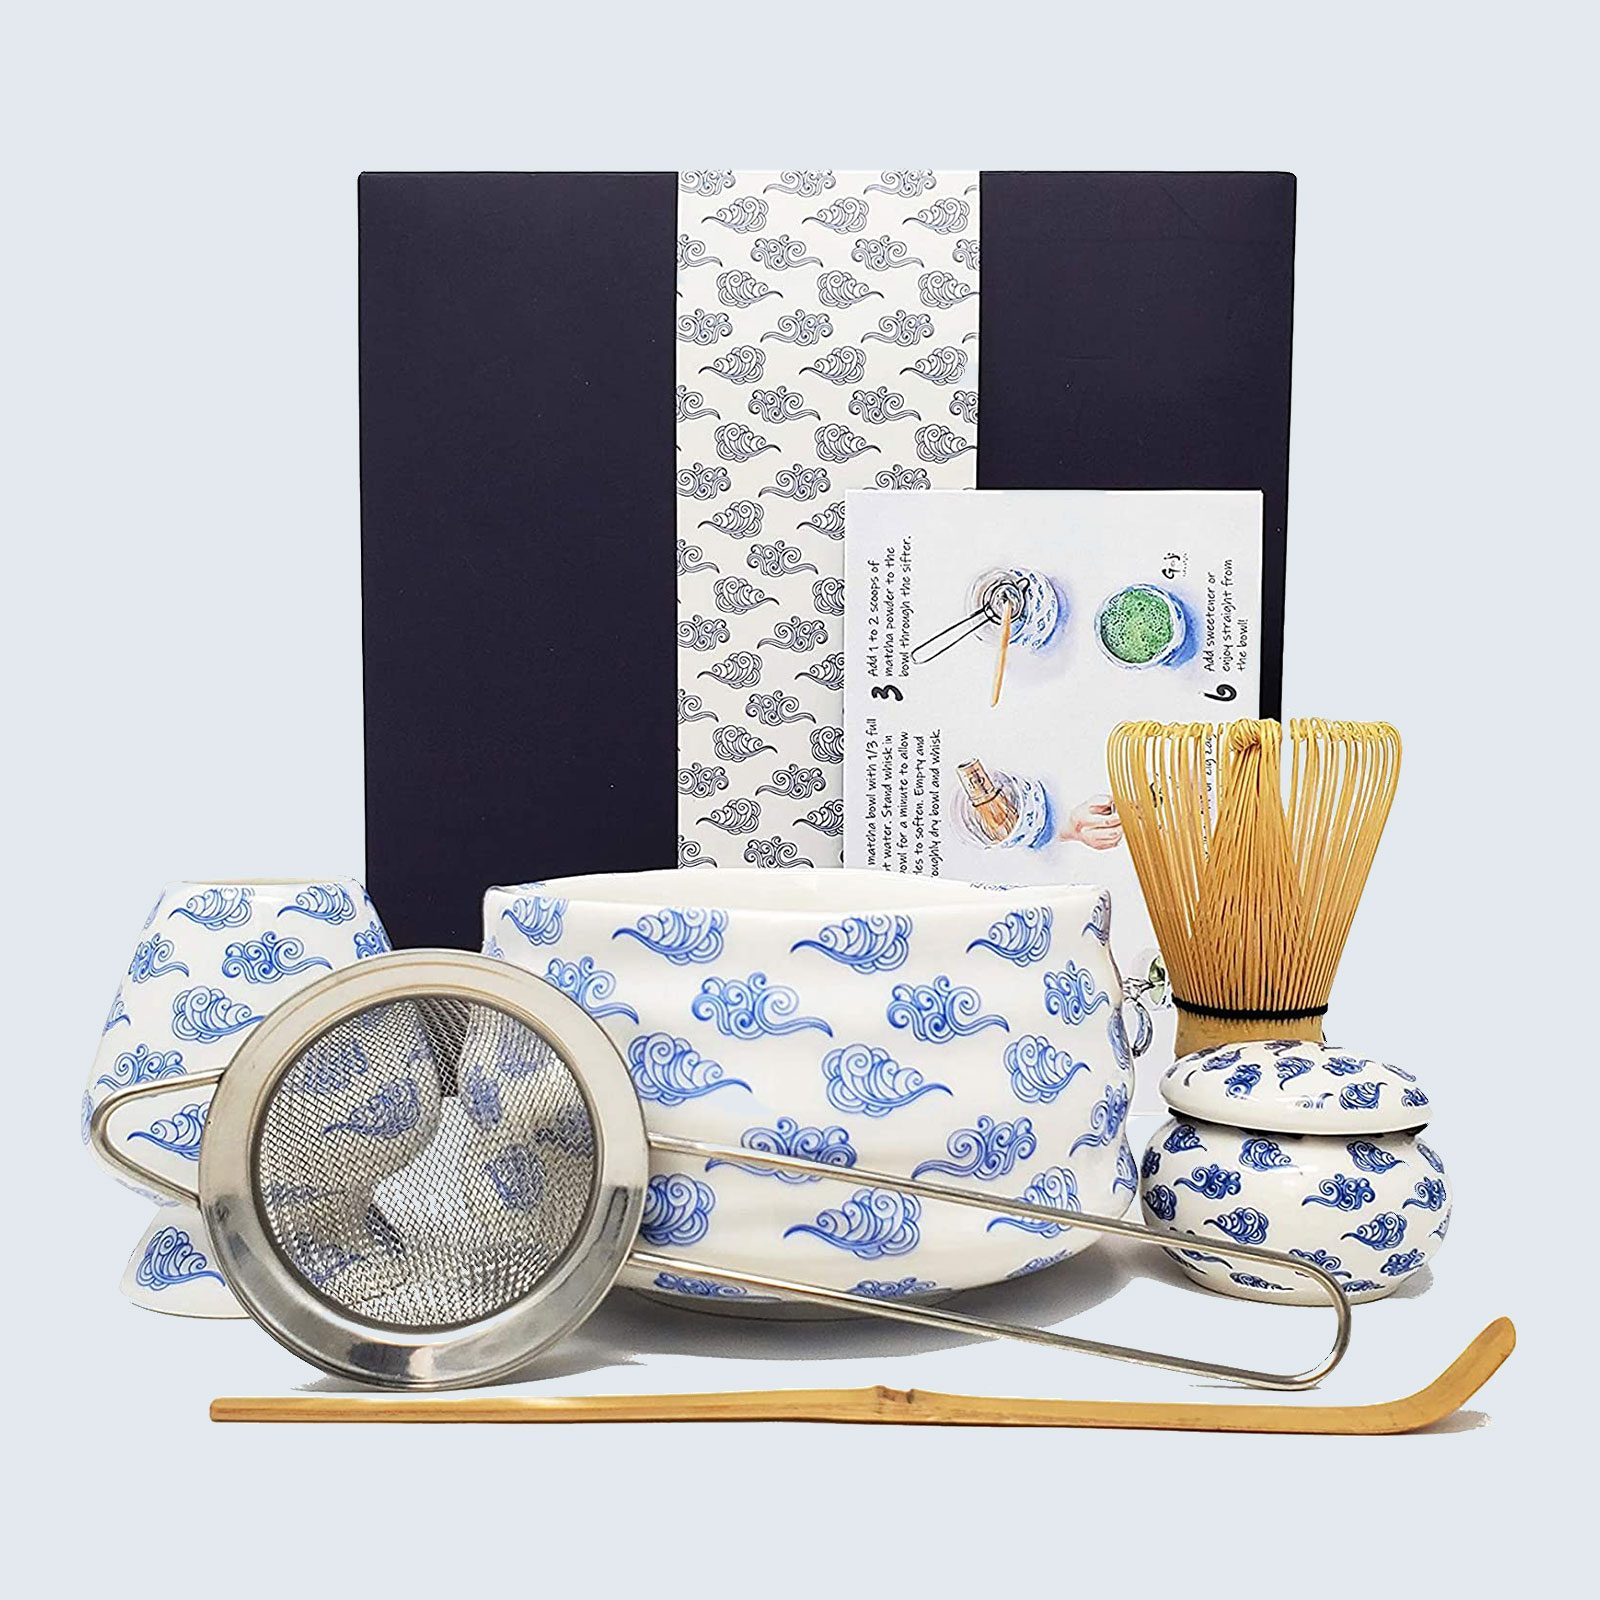 For the matcha-loving mama: Goji Lifestyle Matcha Whisk and Bowl Set